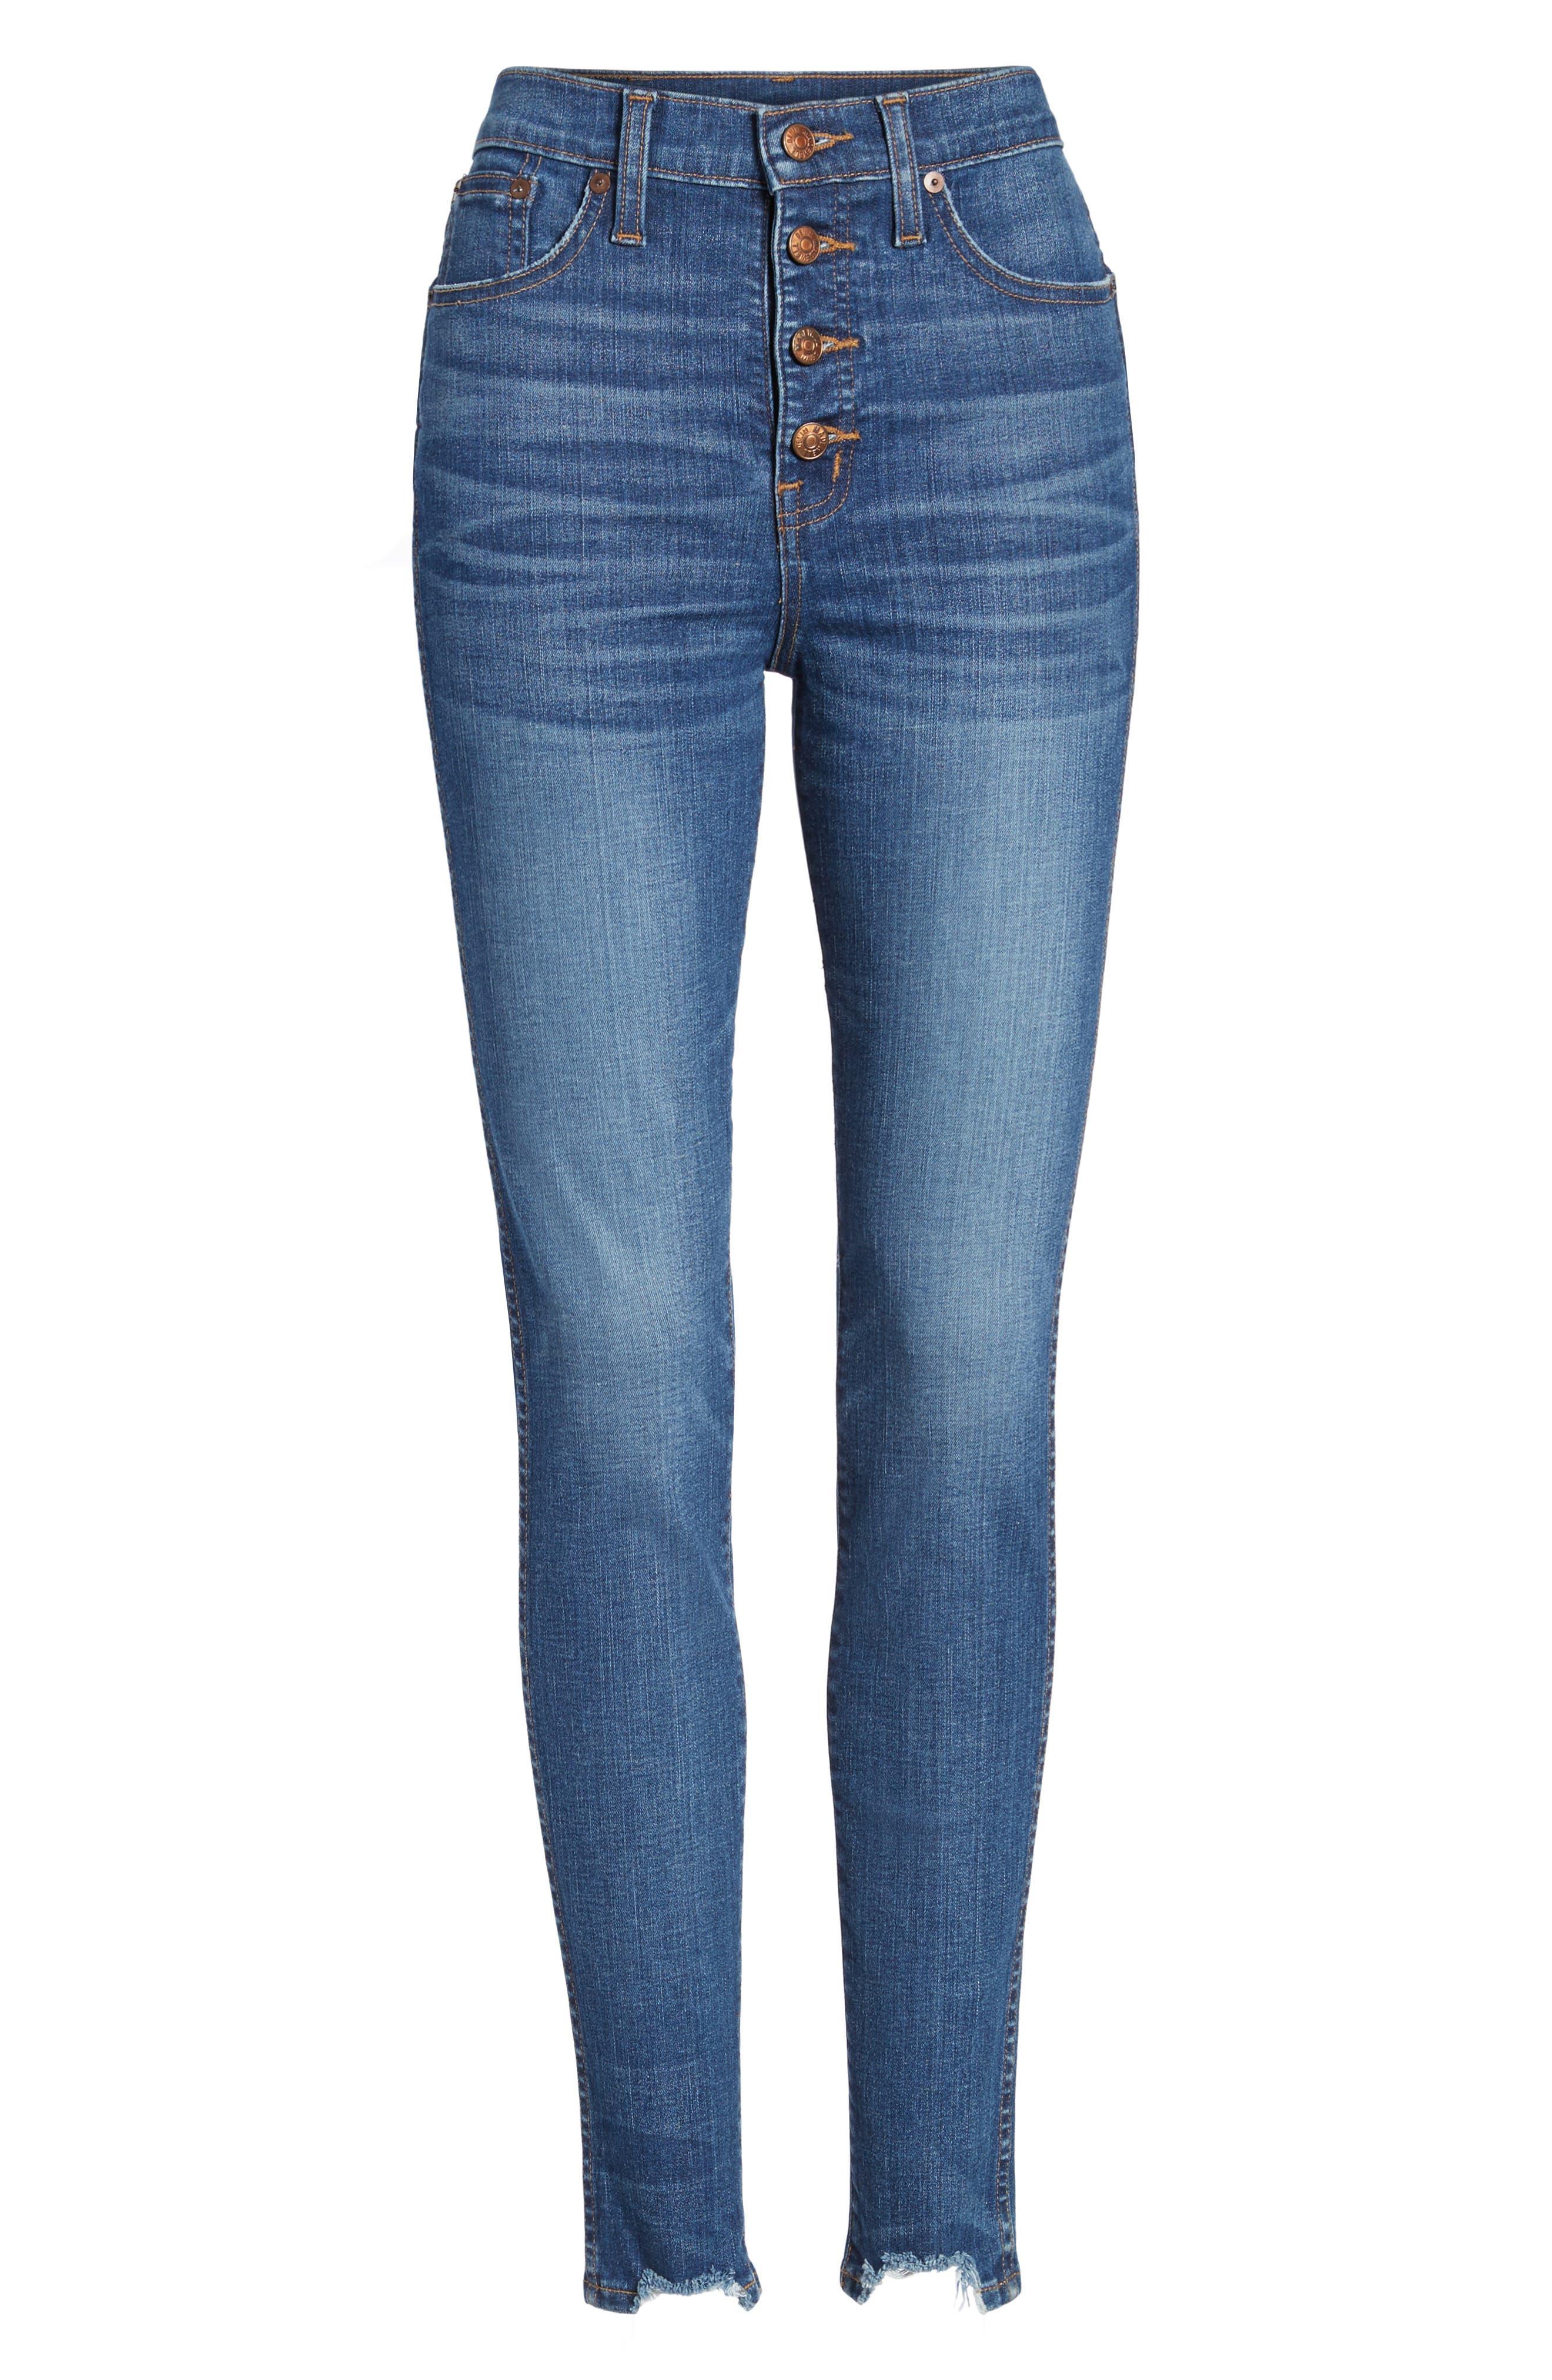 10-Inch Chewed Hem Skinny Jeans,                             Alternate thumbnail 6, color,                             400